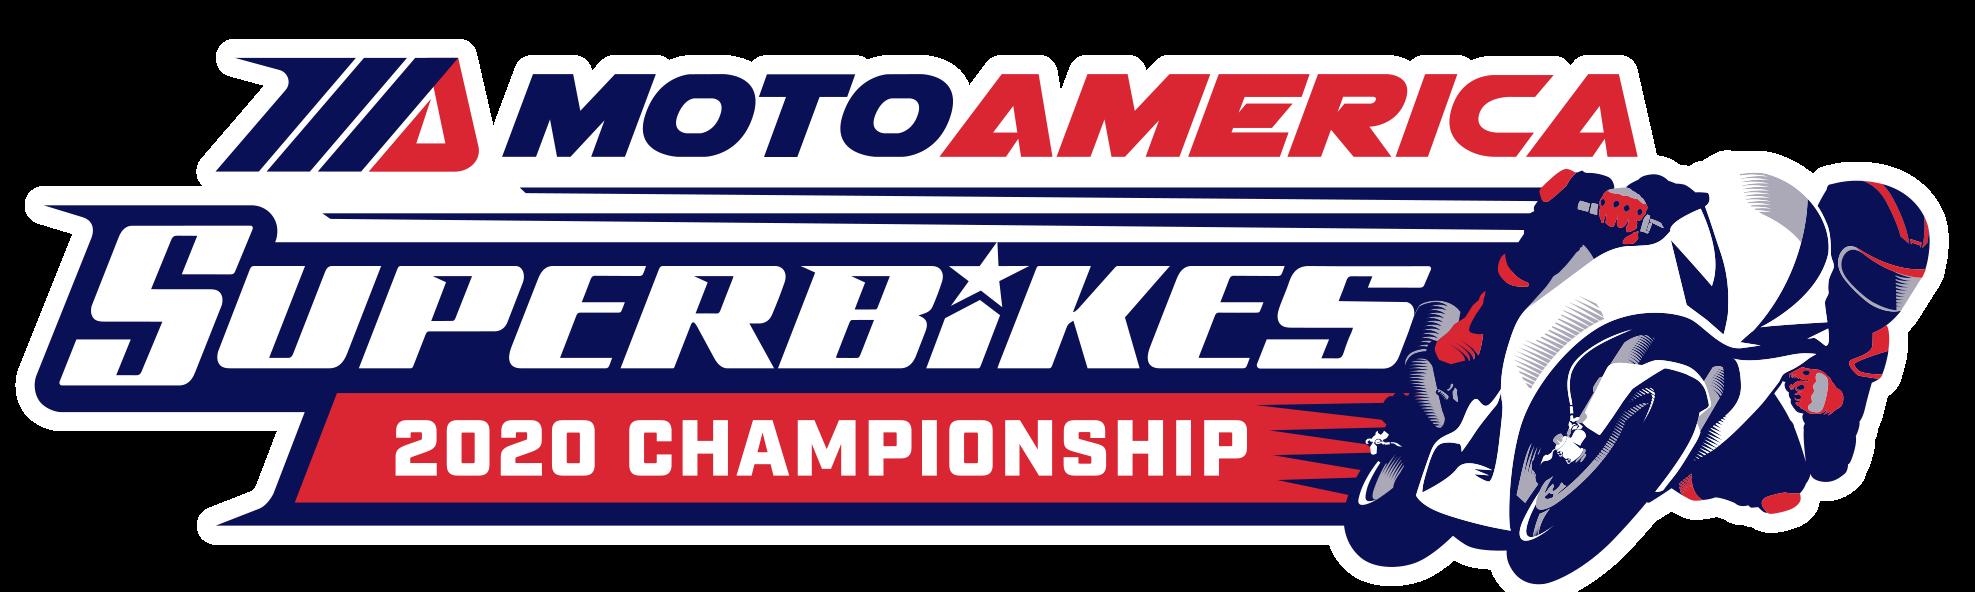 MotoAmerica Superbikes Championship